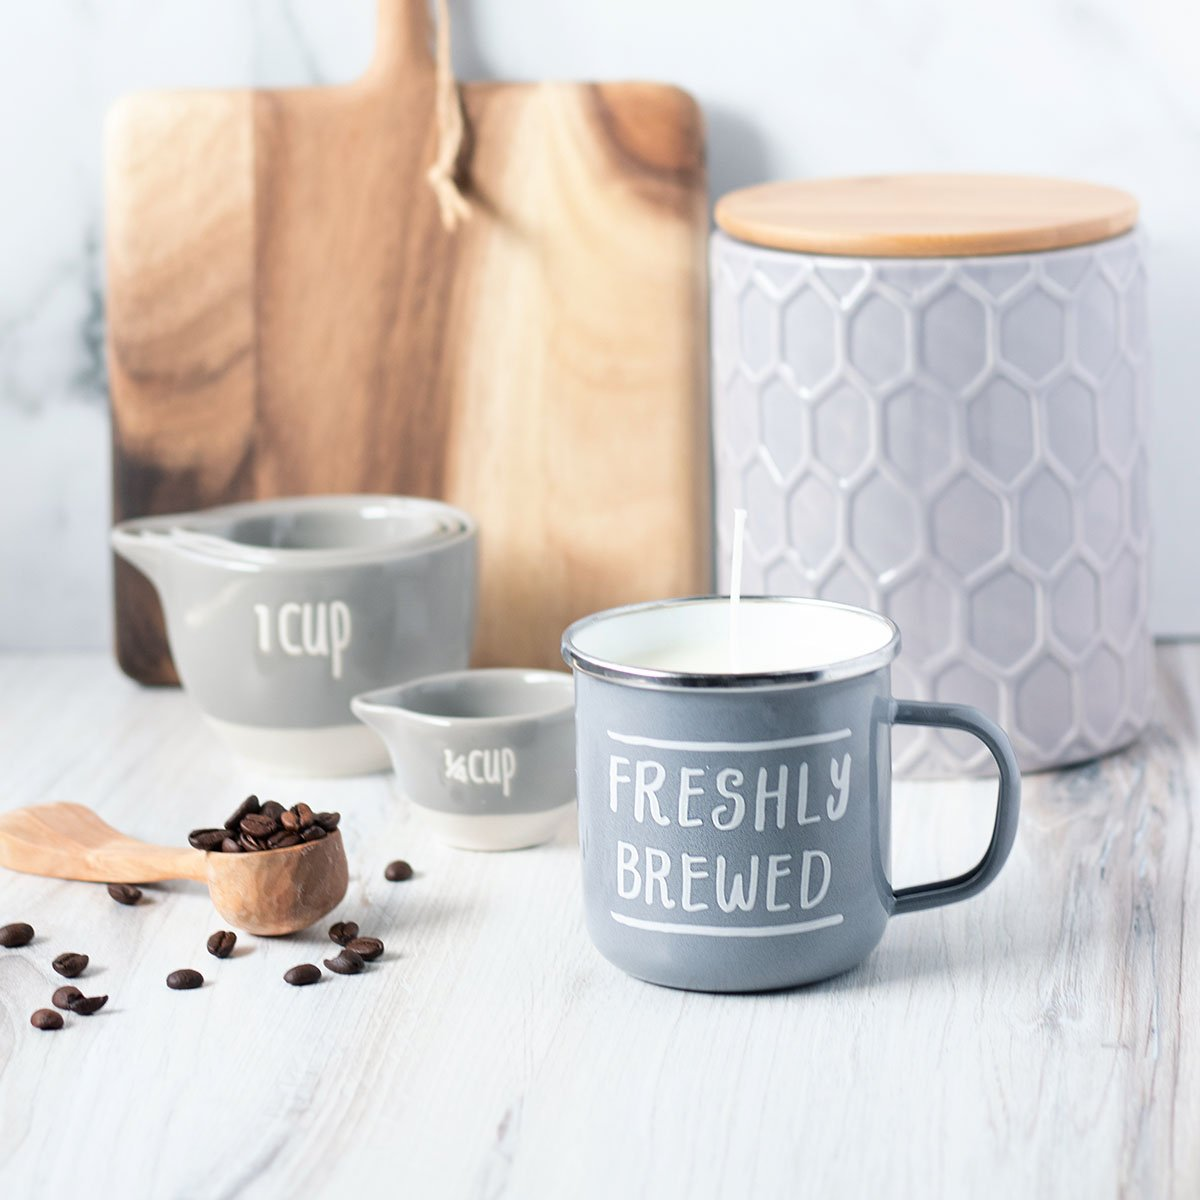 Enamel Coffee Mug Candle How To Make Candles In A Mug